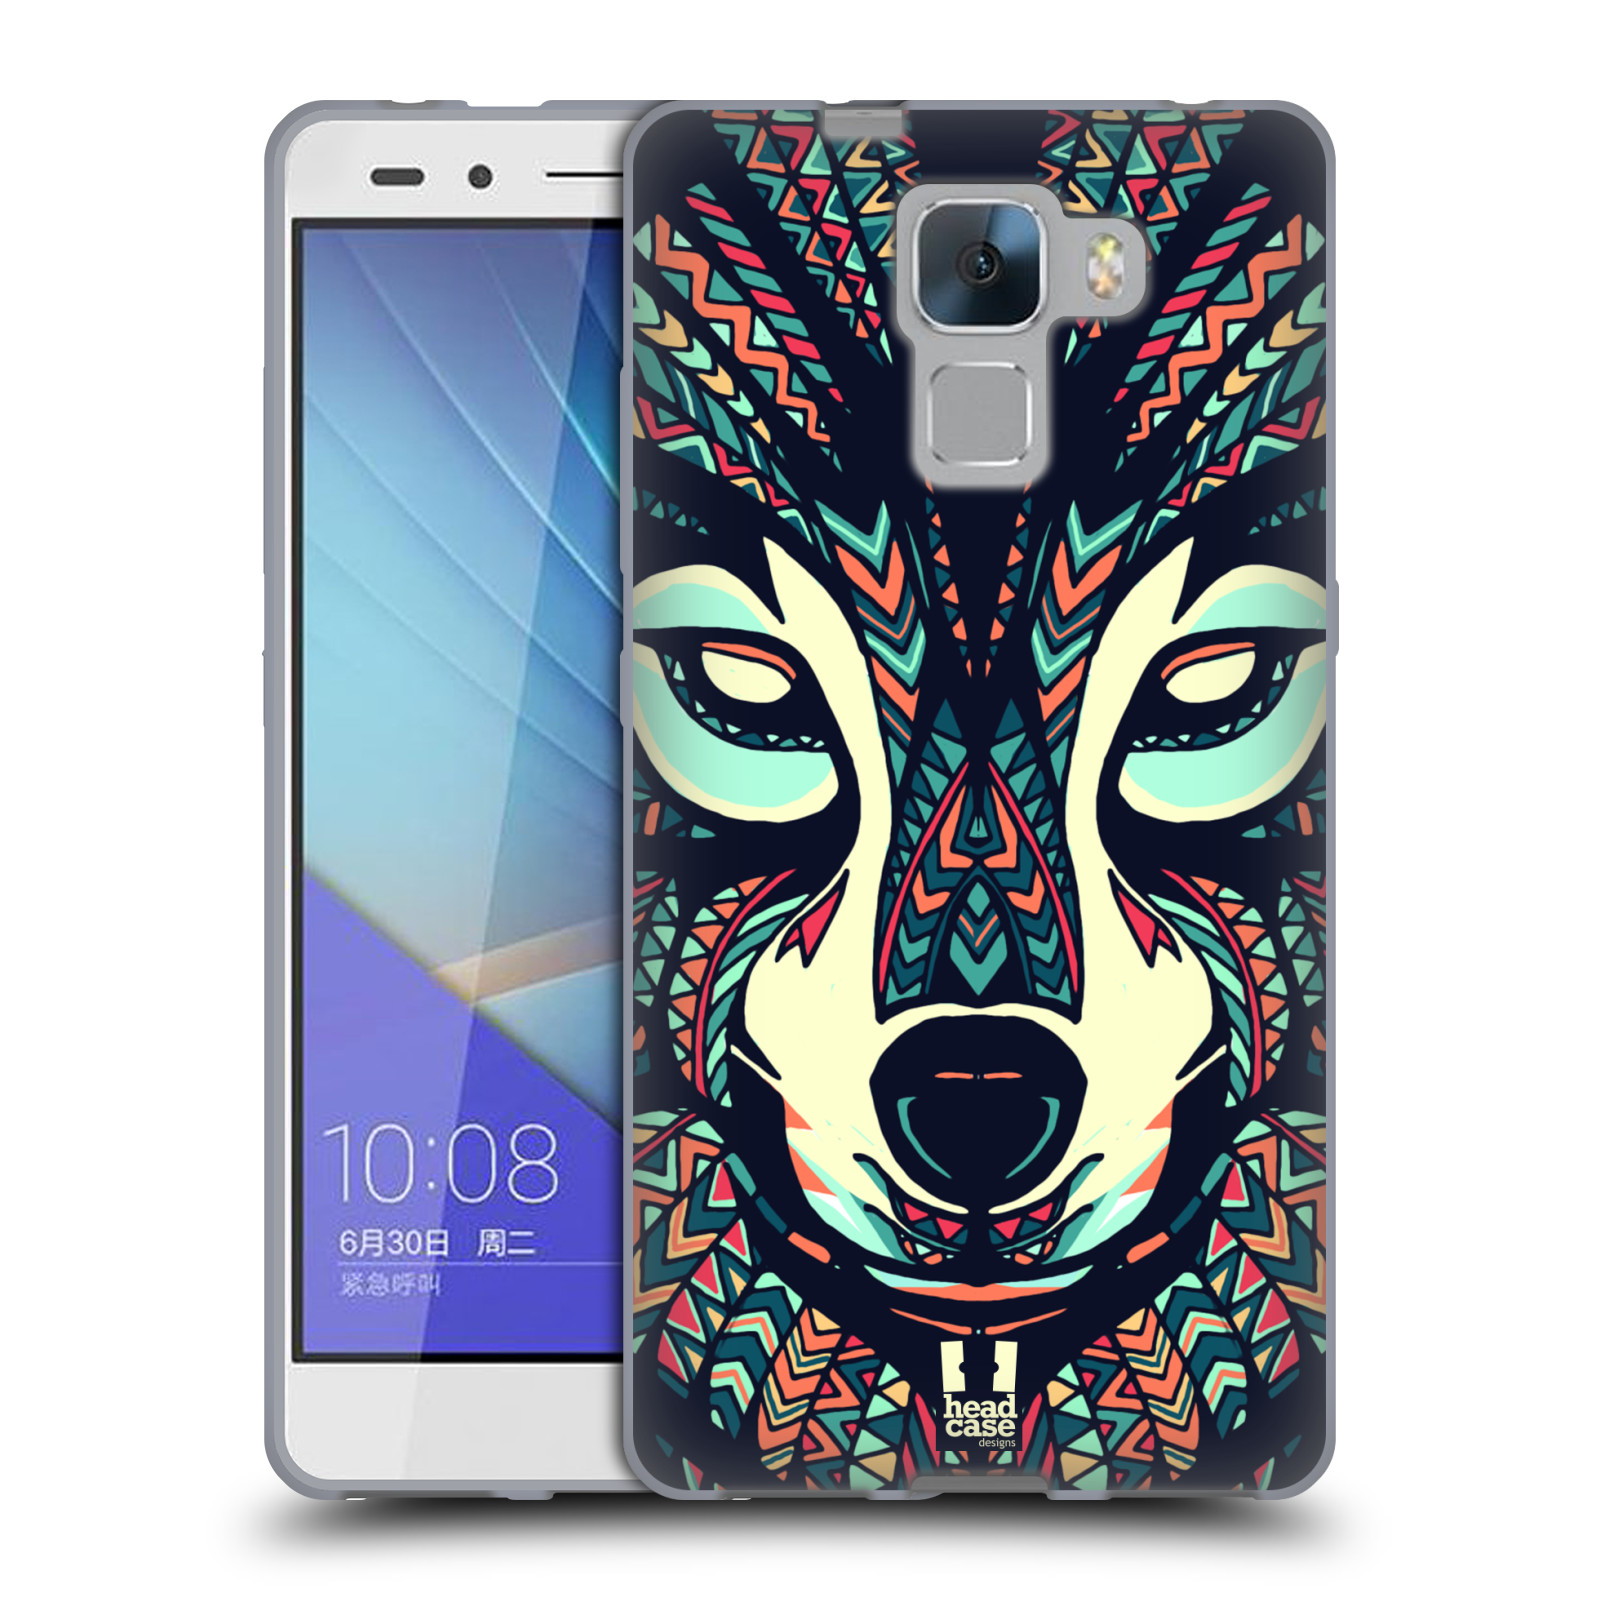 Silikonové pouzdro na mobil Honor 7 HEAD CASE AZTEC VLK